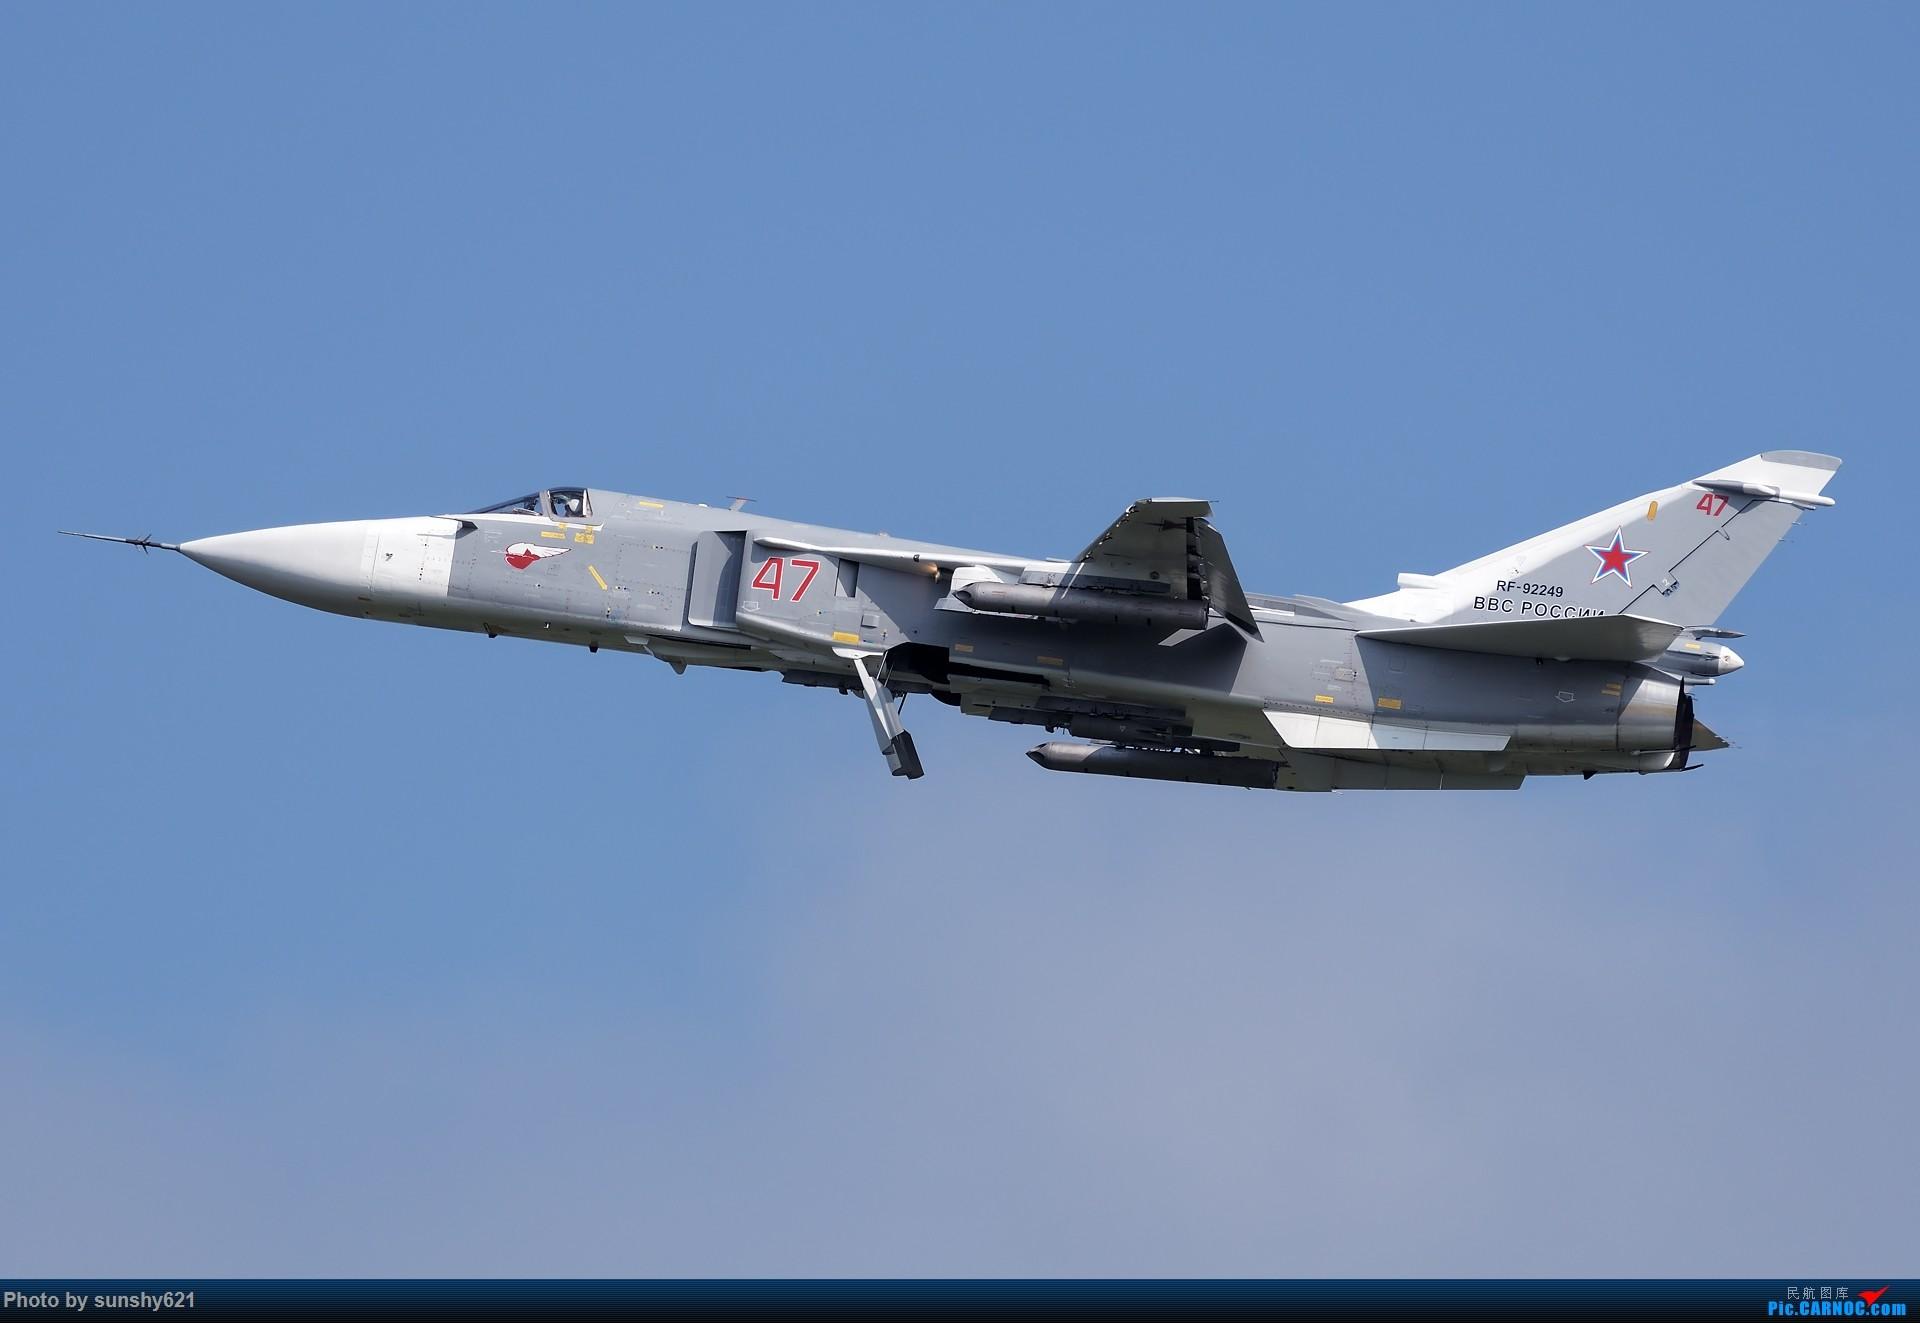 Re:[原创]★[DLC]一点有趣的事情(国庆加点儿料)★ 西安飞豹科技 小鹰100 XY-1 RF-92249 中国大连国际机场